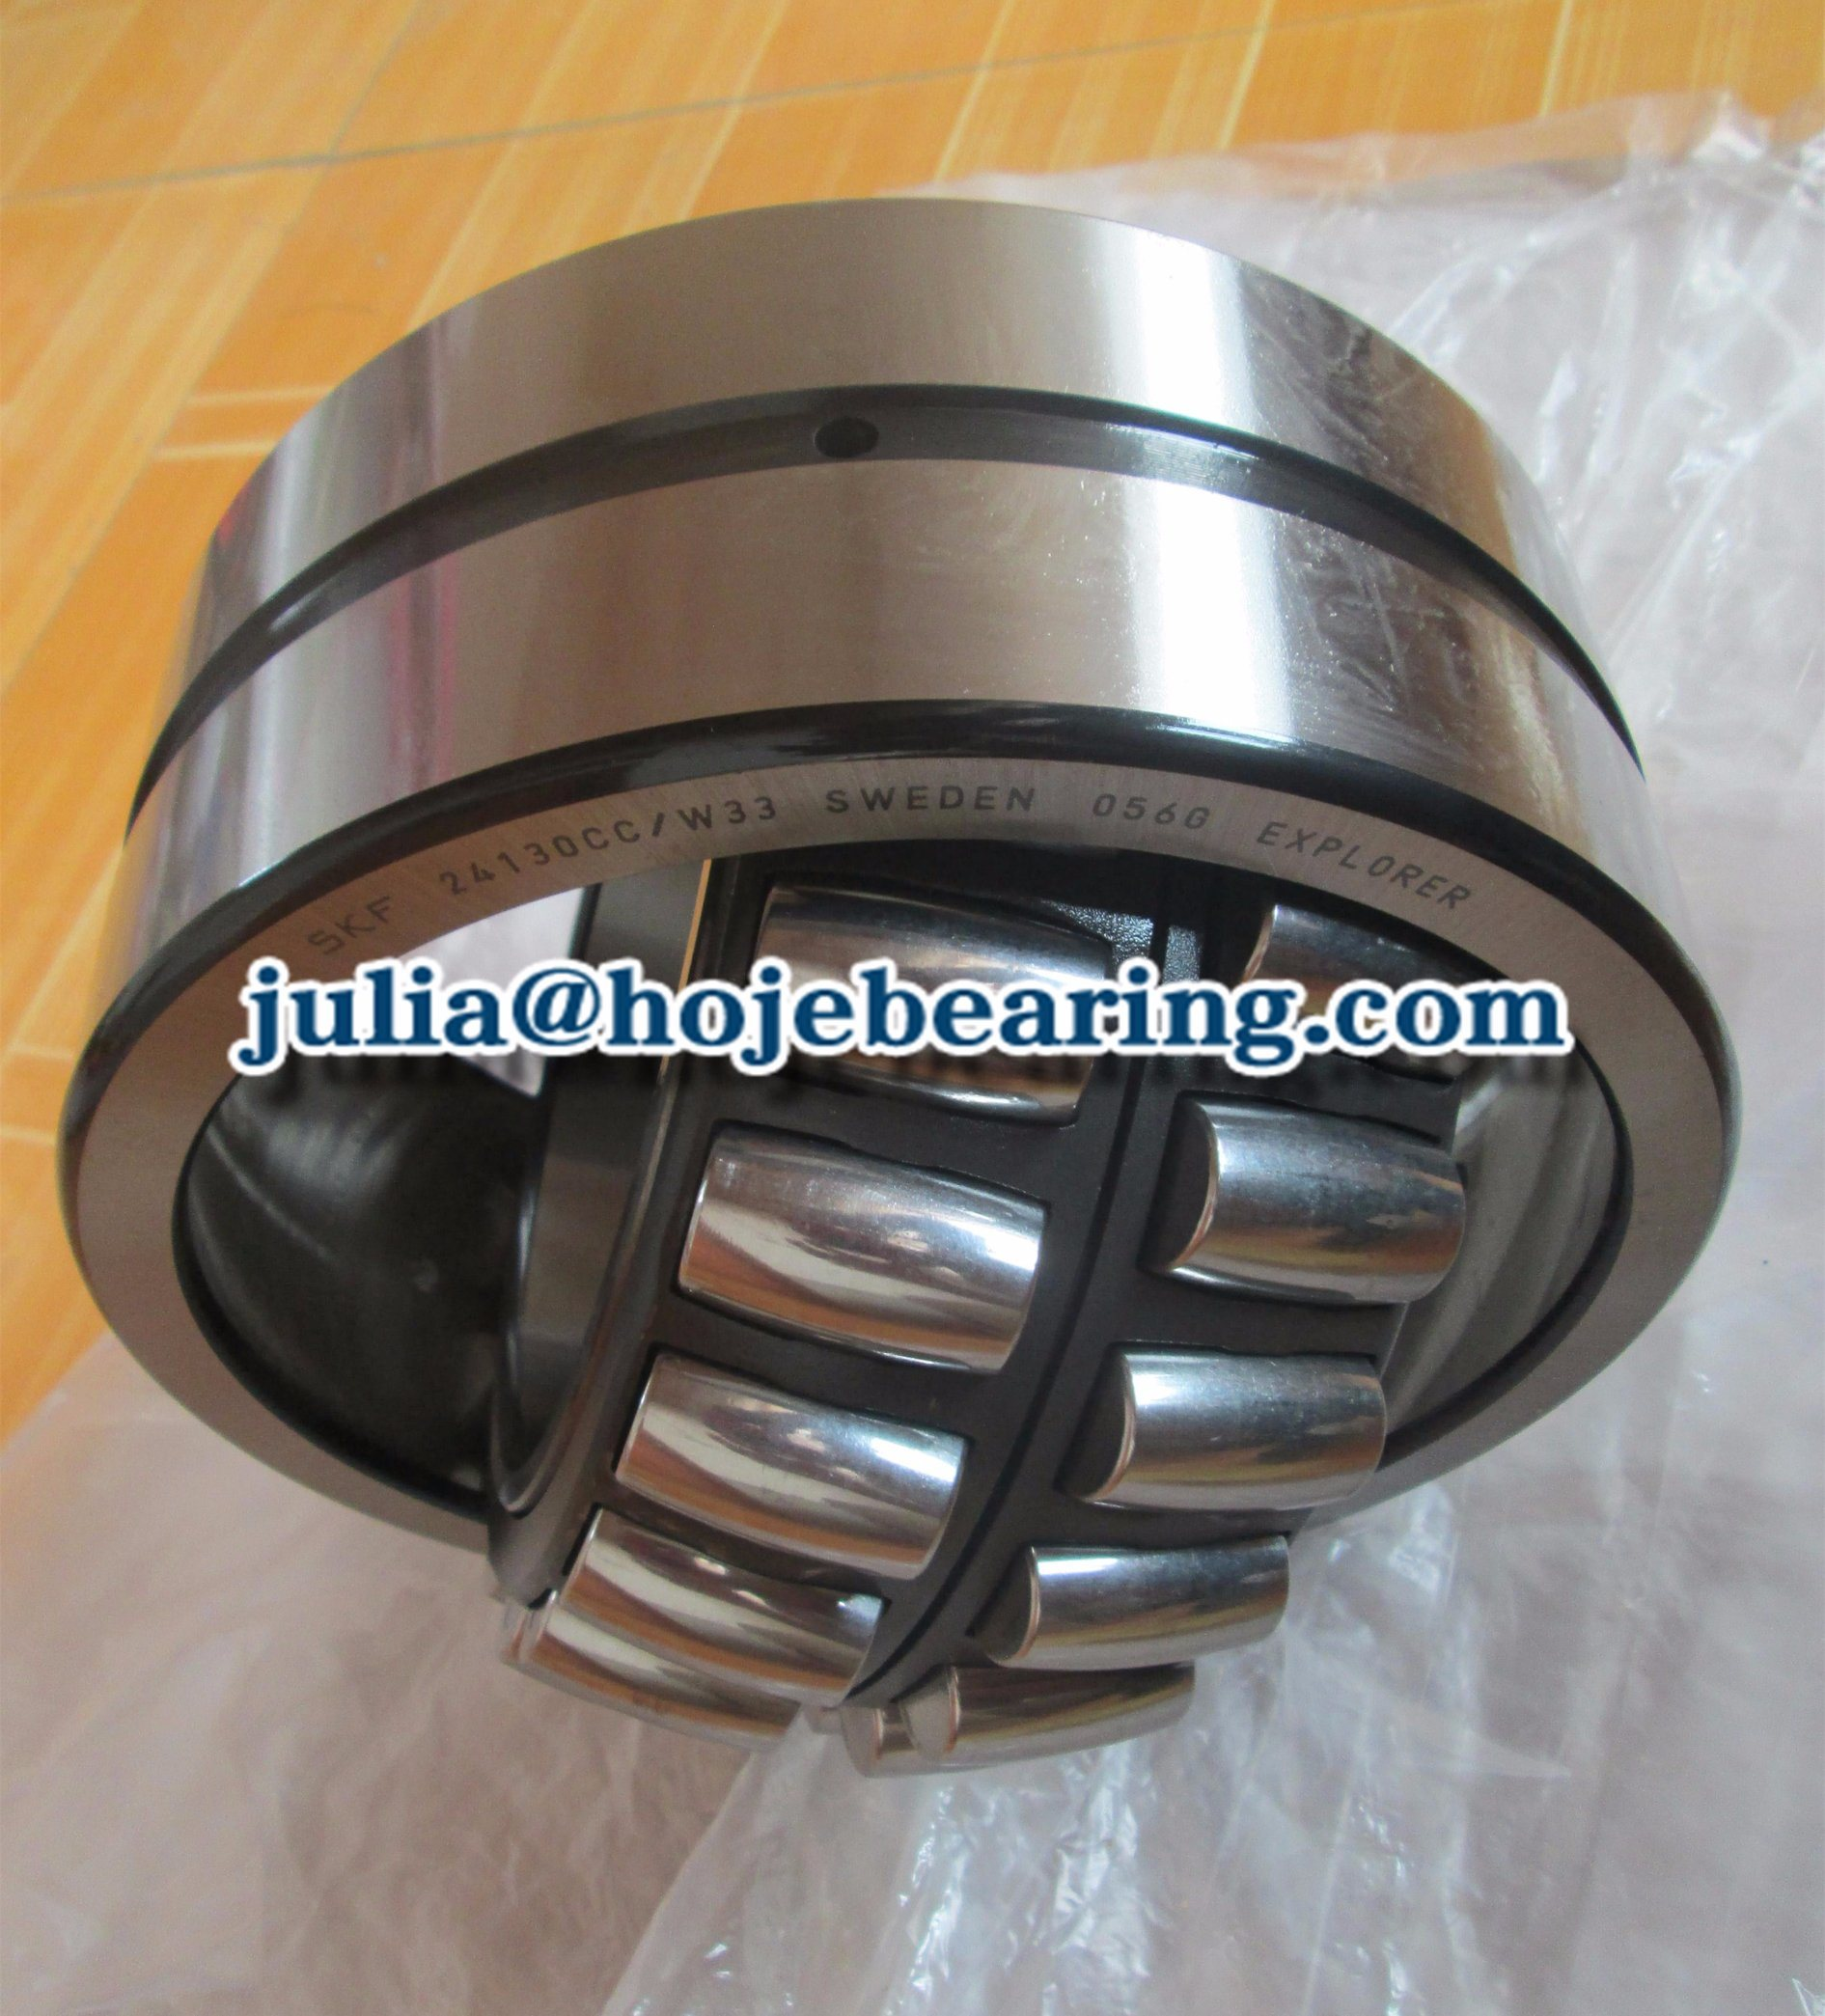 241/1000 Radail Bearing Spherical Roller Bearing 240/1000 SKF Bearings Manufature